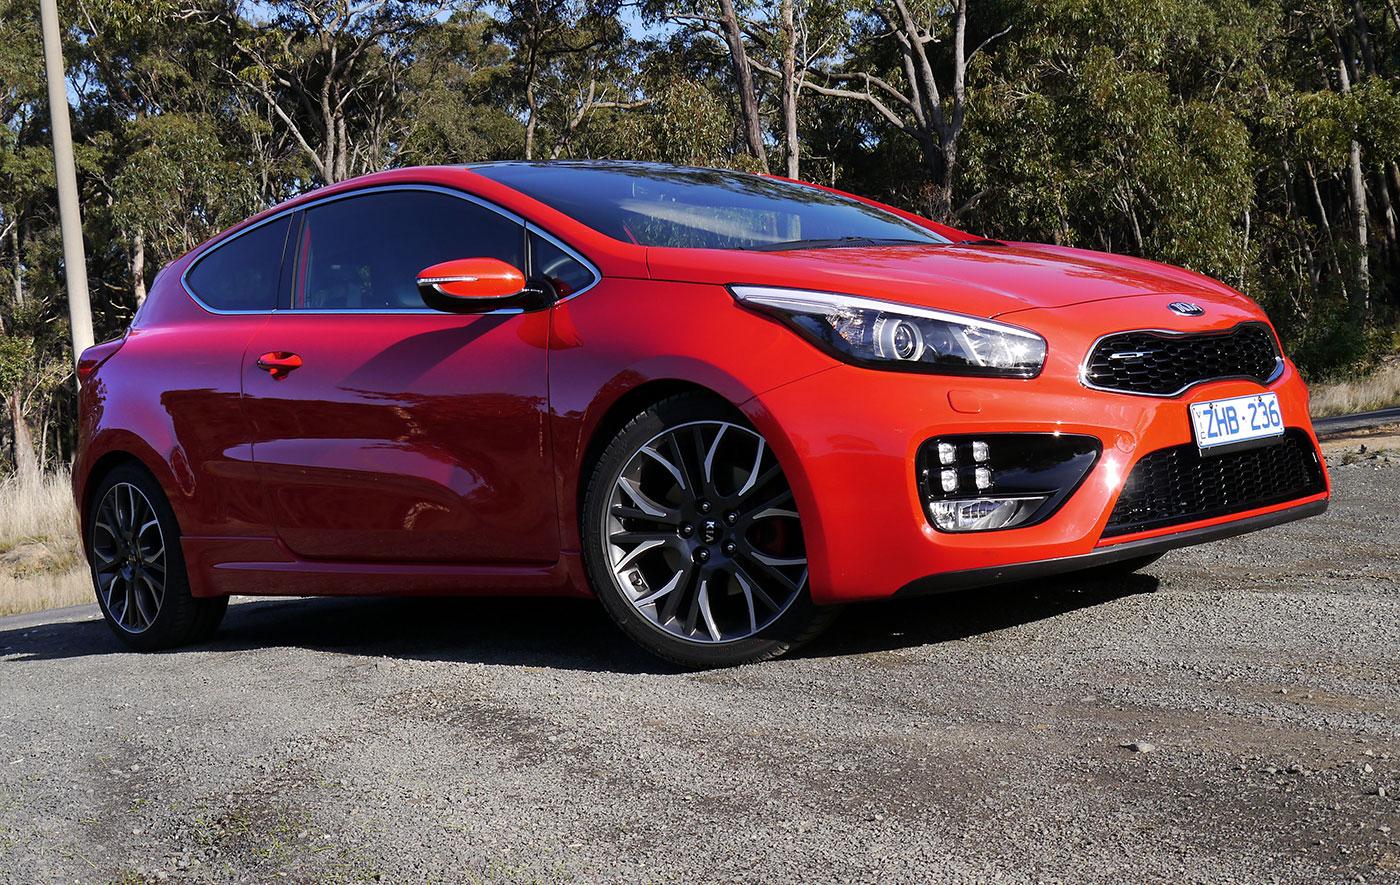 2014 Kia Pro_Cee'd GT Review: Tech Pack